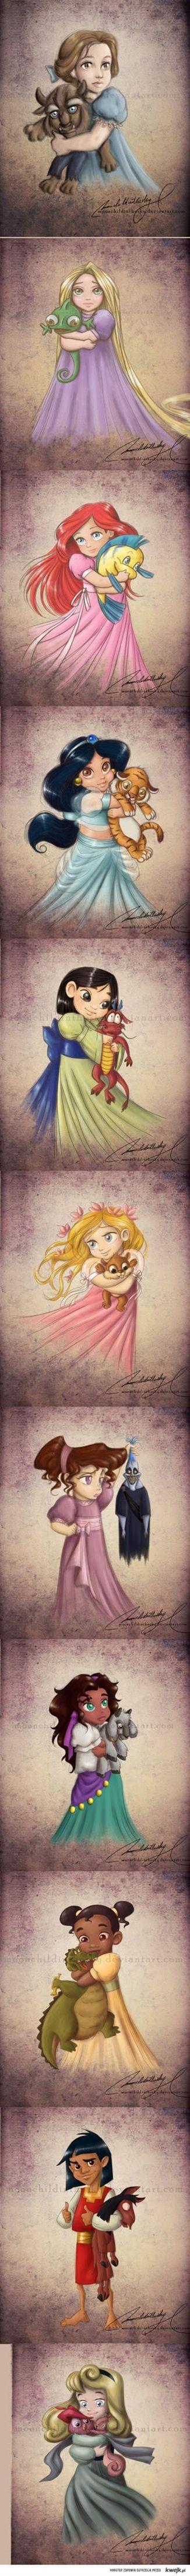 Precious! Baby Disney Princess Characters